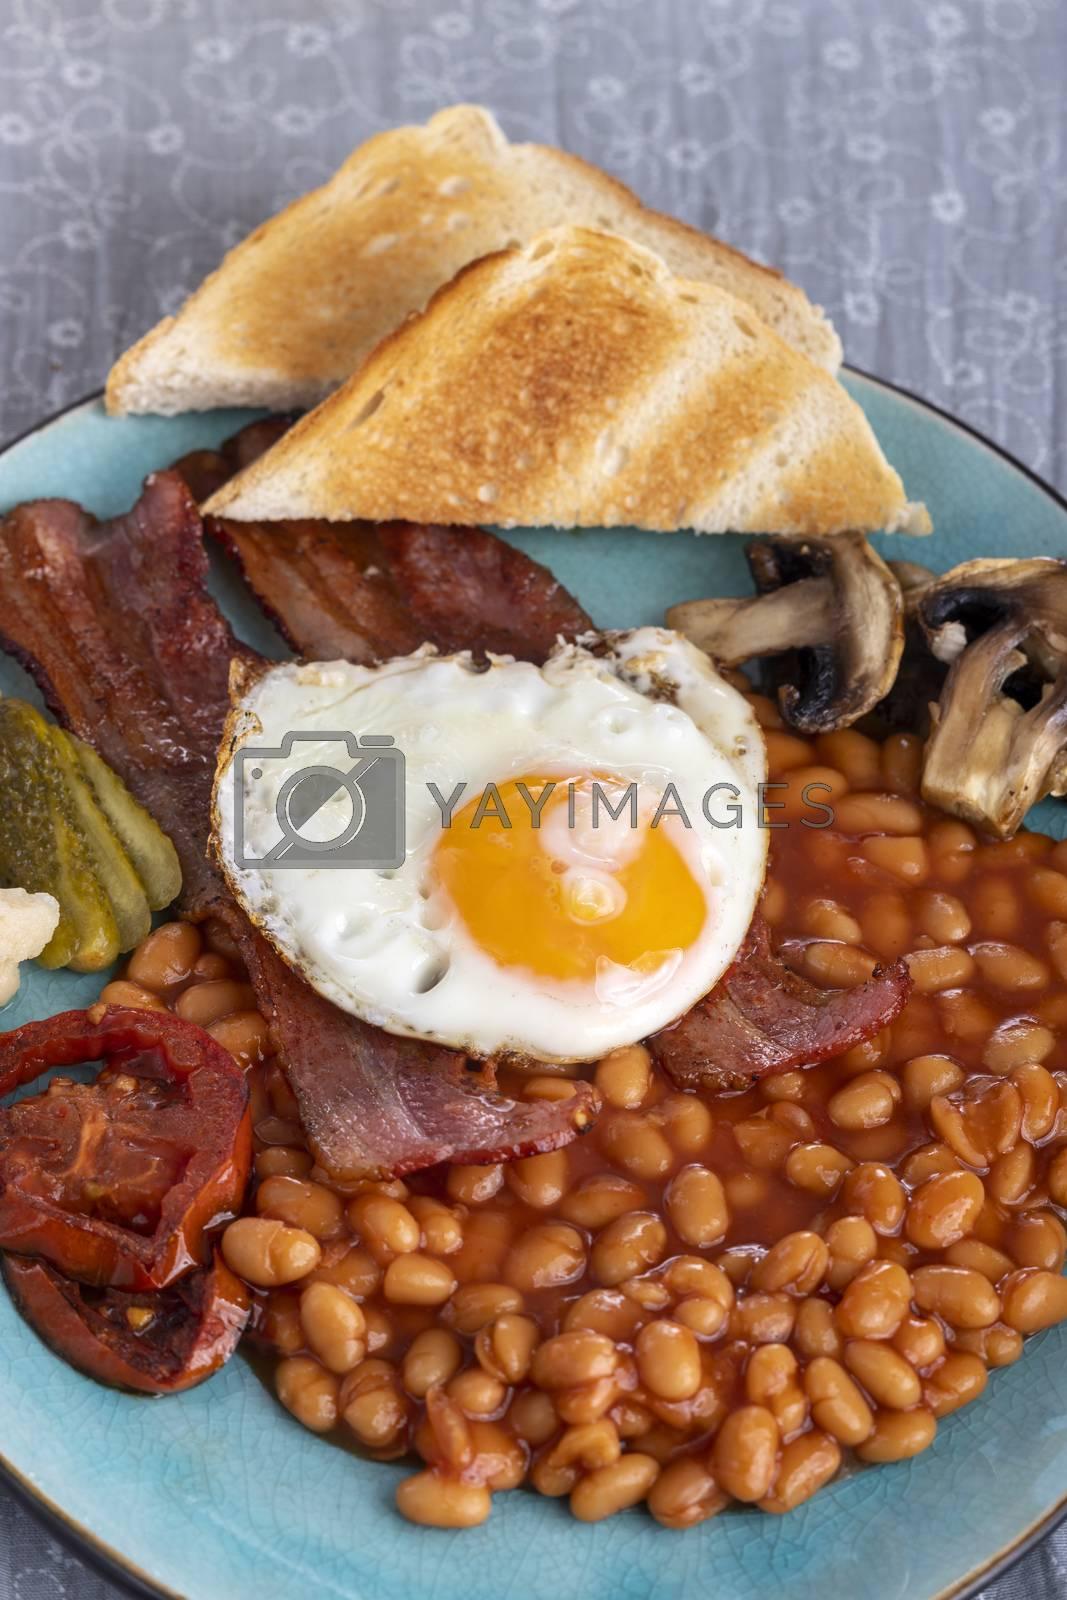 full englisch breakfast on a plate